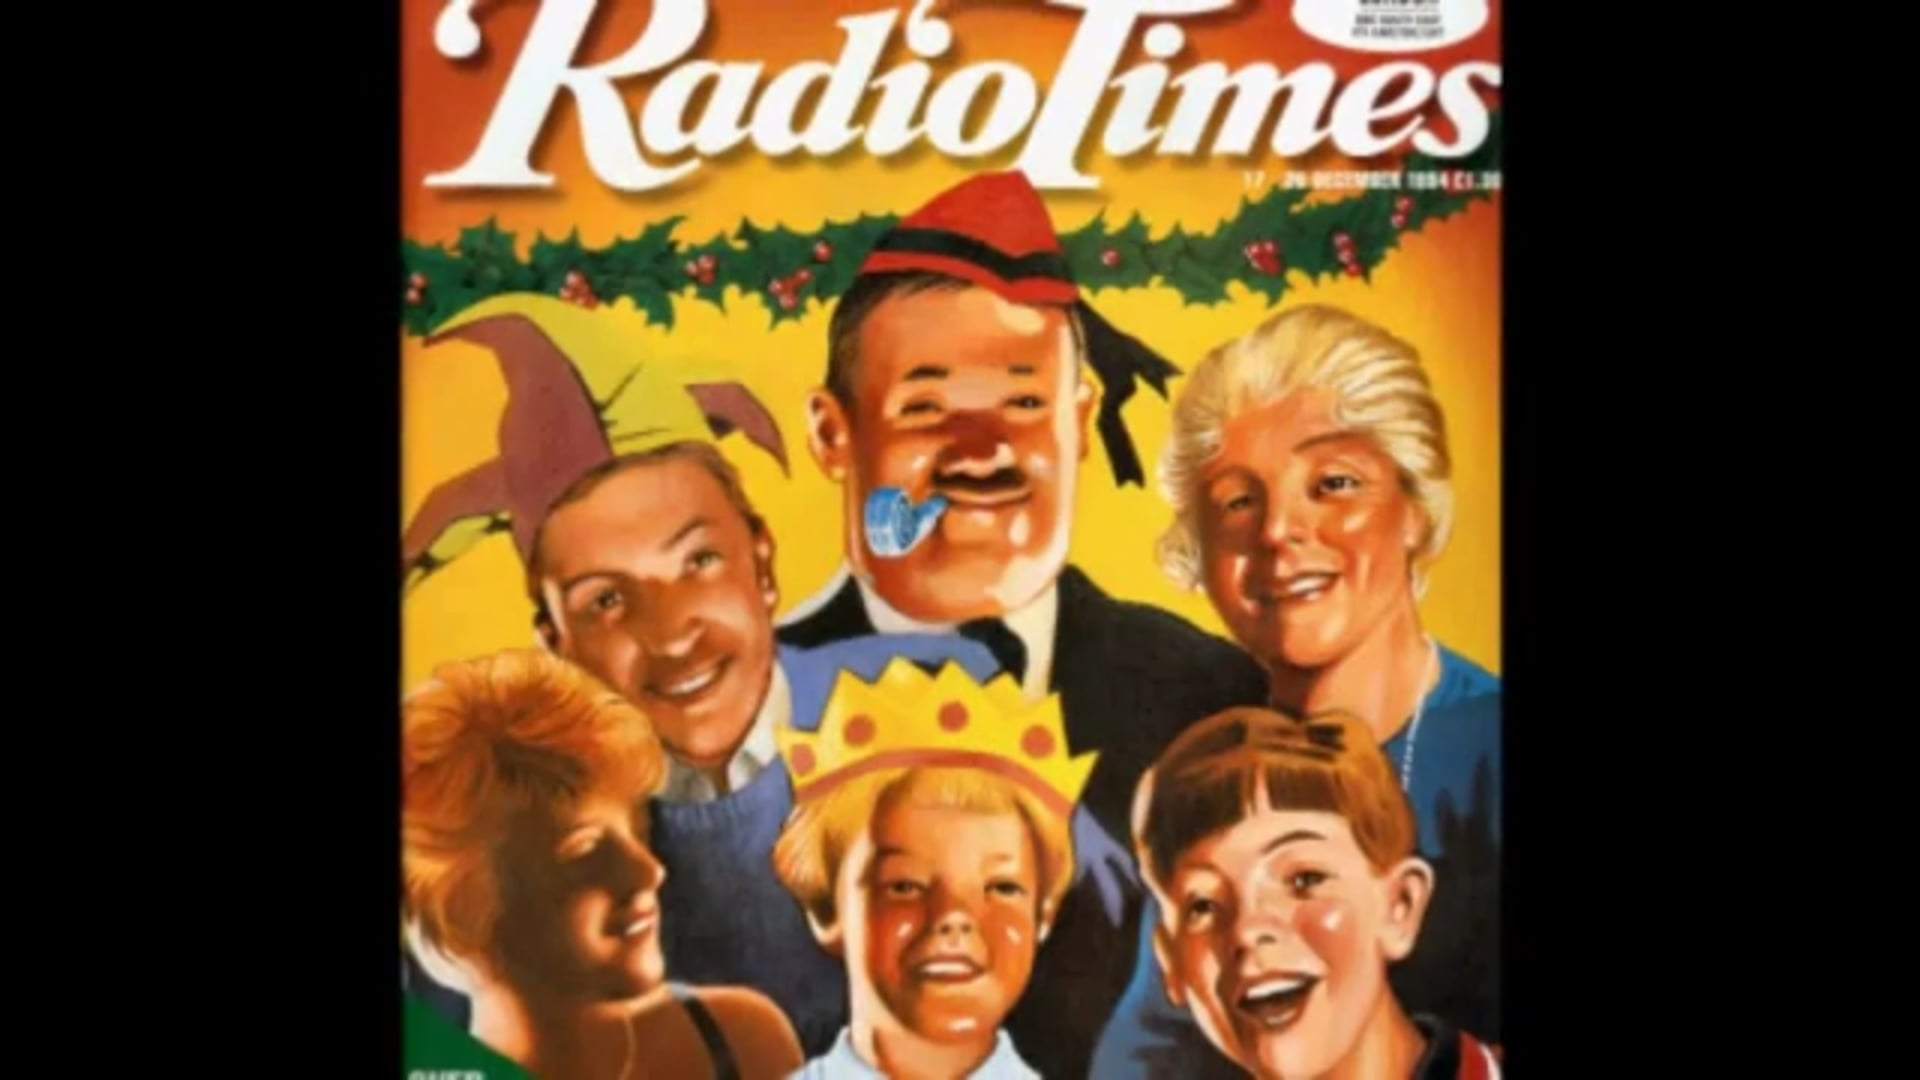 Further Christmas Wrapping: Radio Times gets Festive